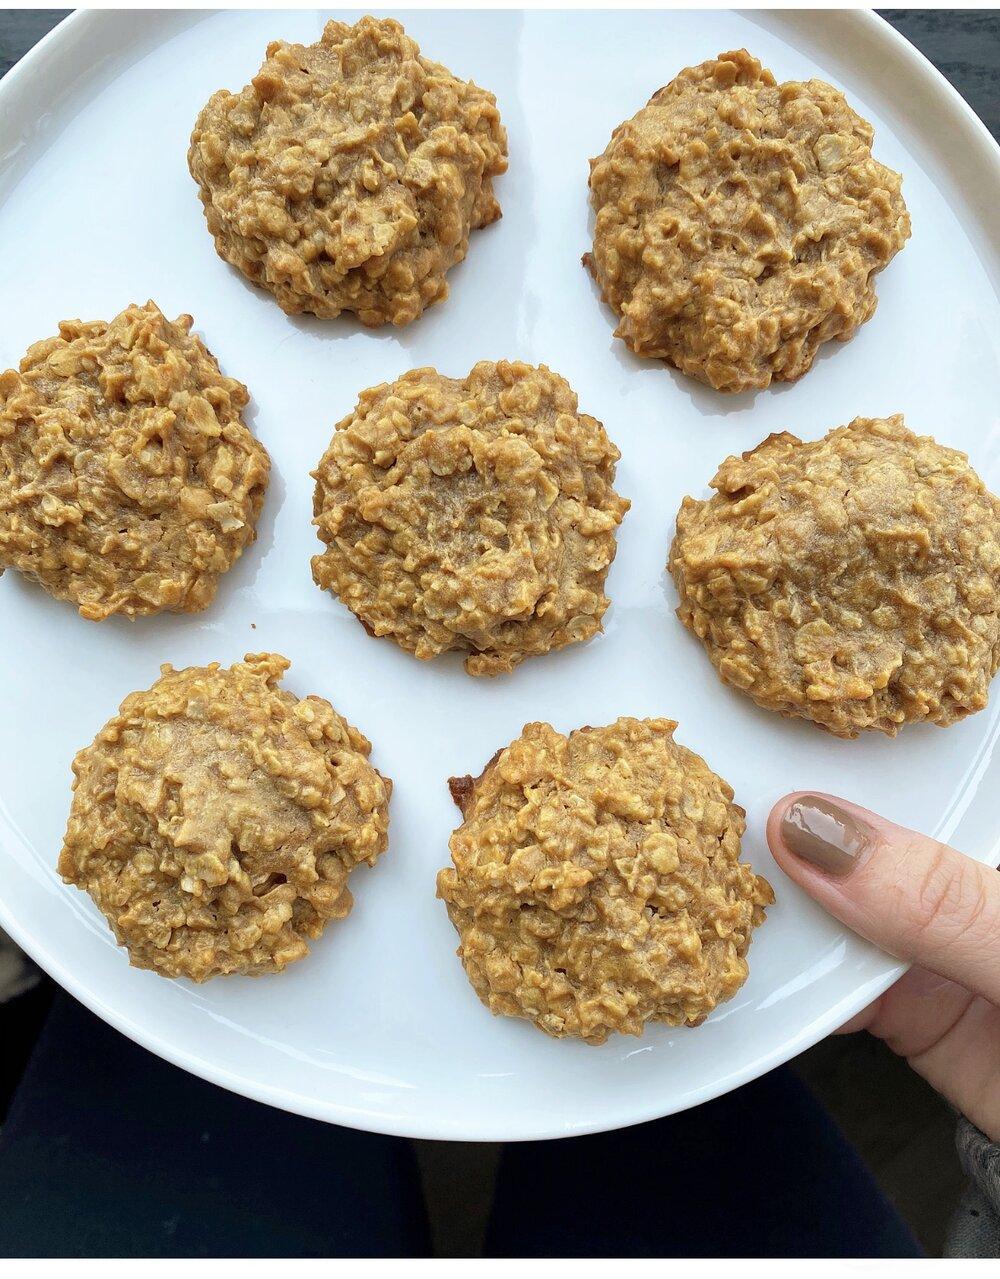 Healthy Peanut Butter Oatmeal Cookies Sammi Brondo Nyc Based Registered Dietitian Nutritionist